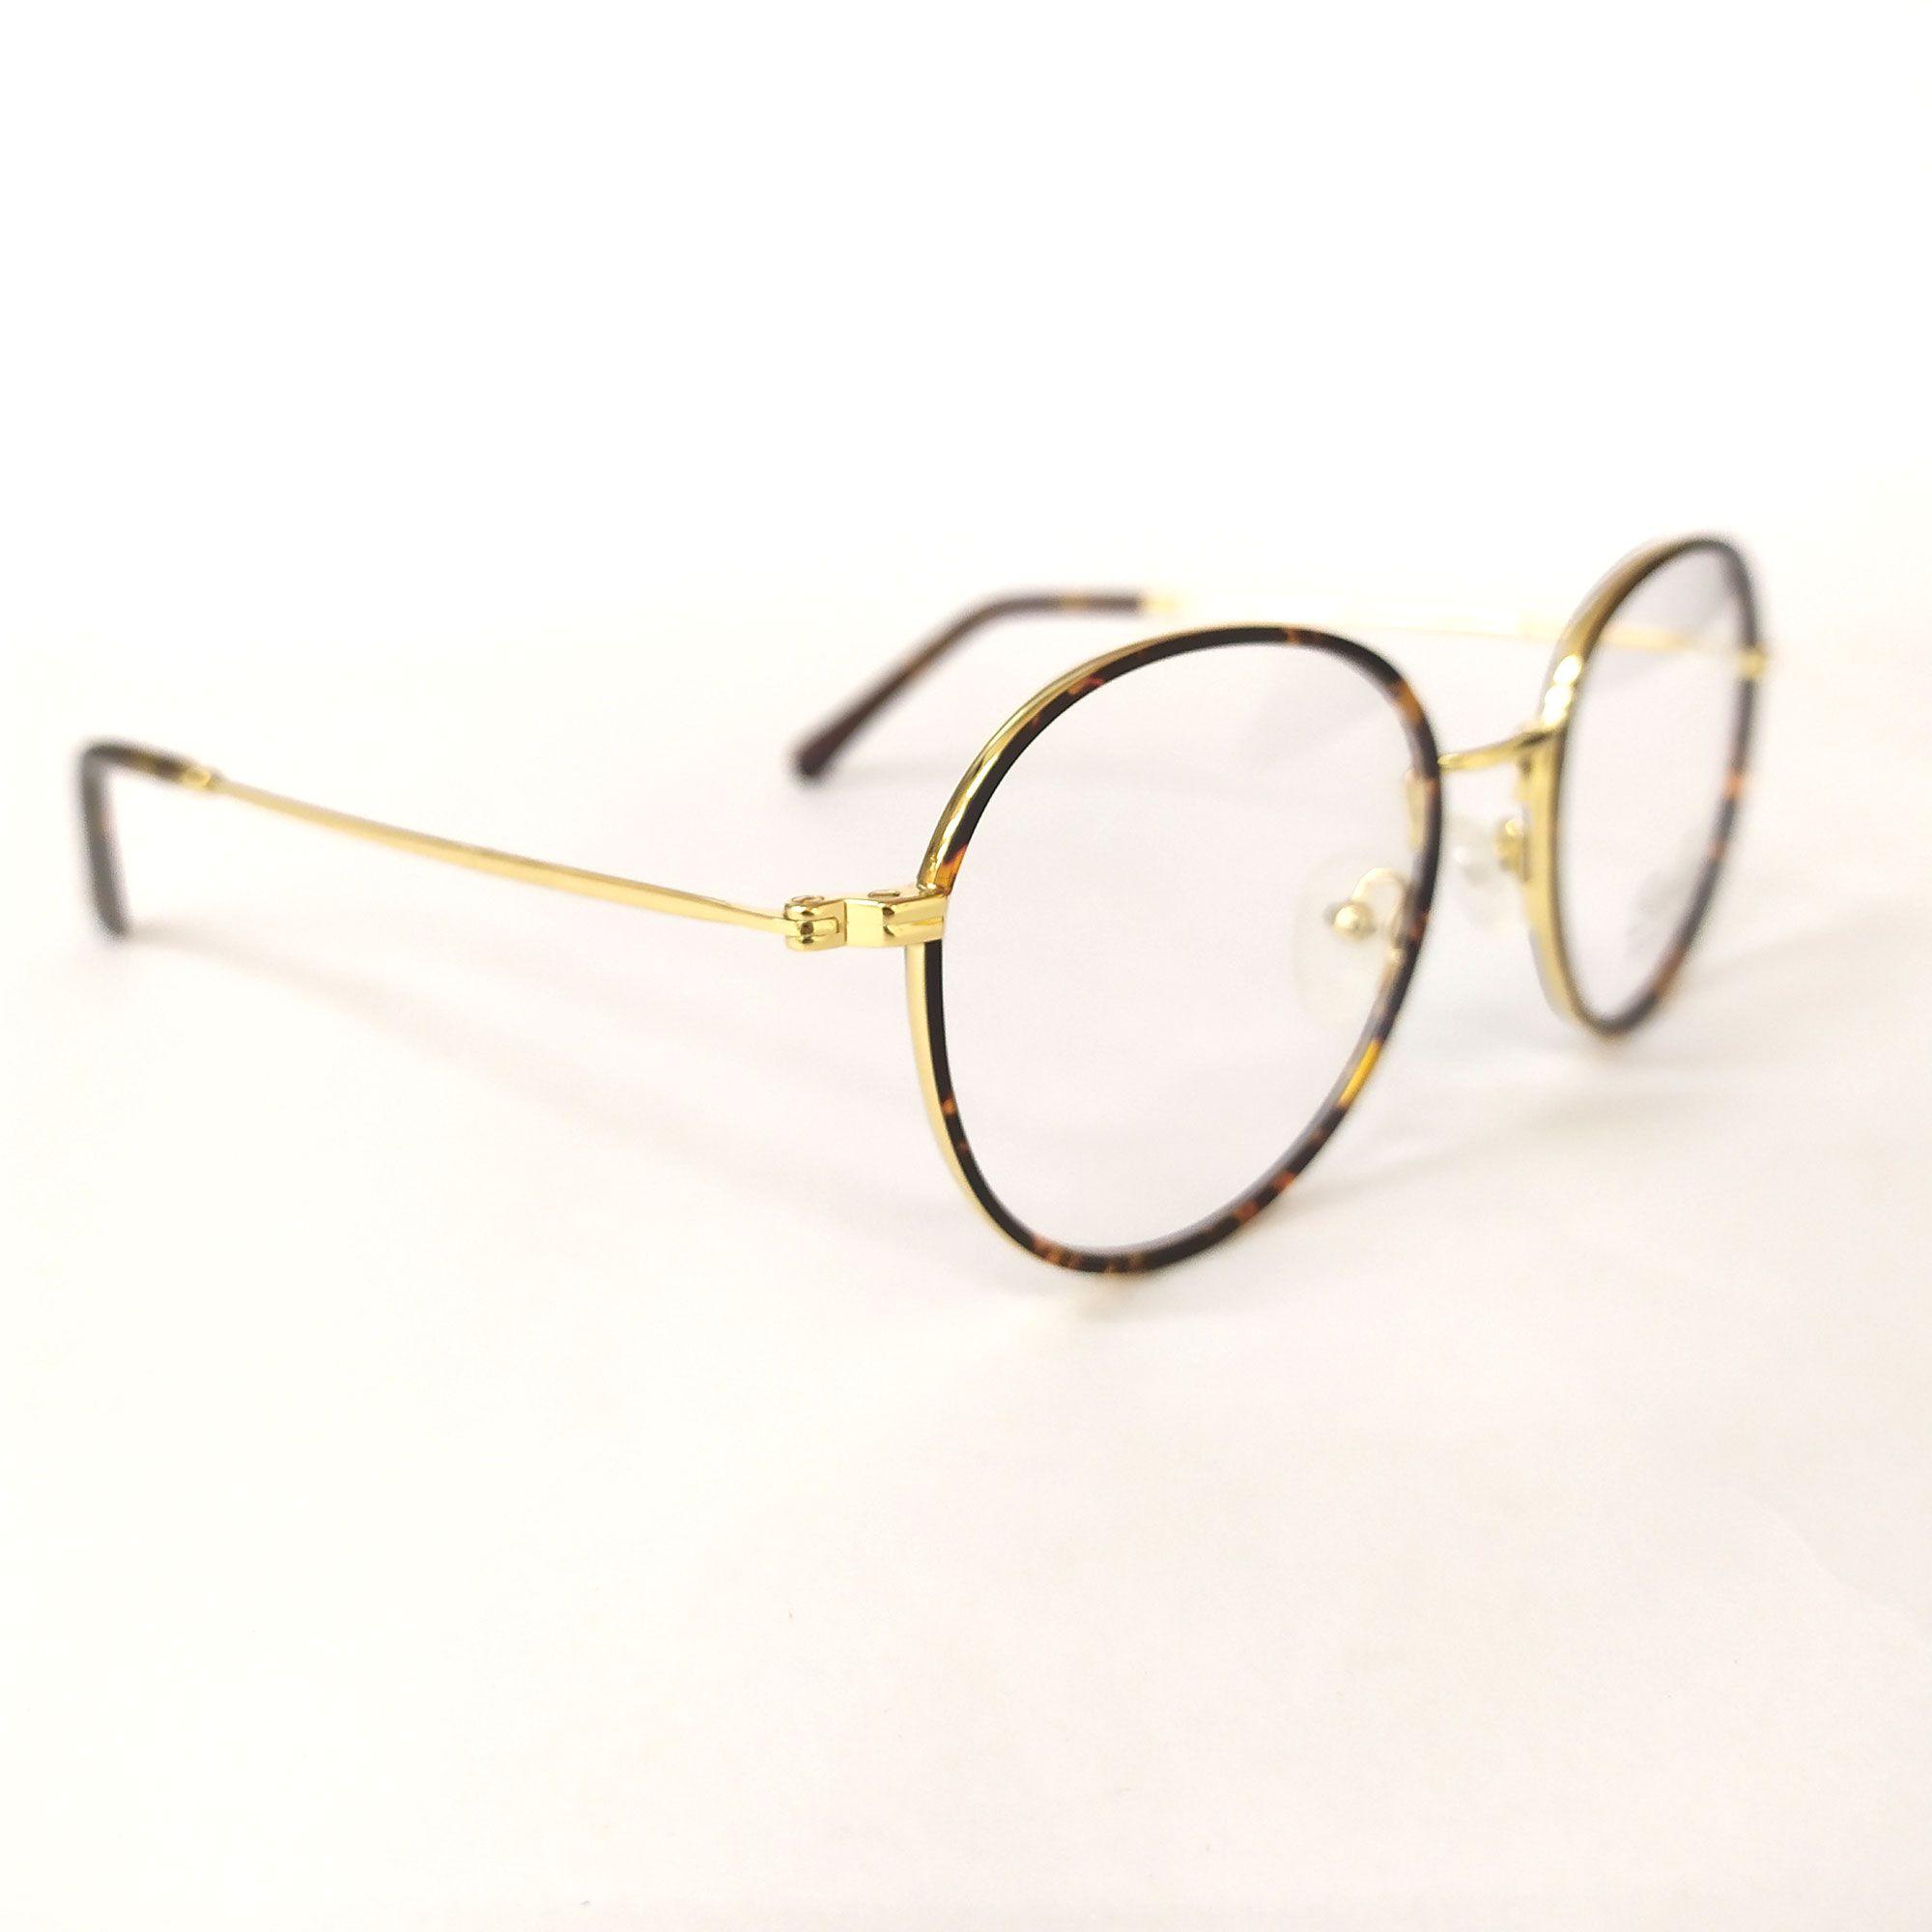 Óculos de Grau Bella Tartaruga e Dourado YS3581